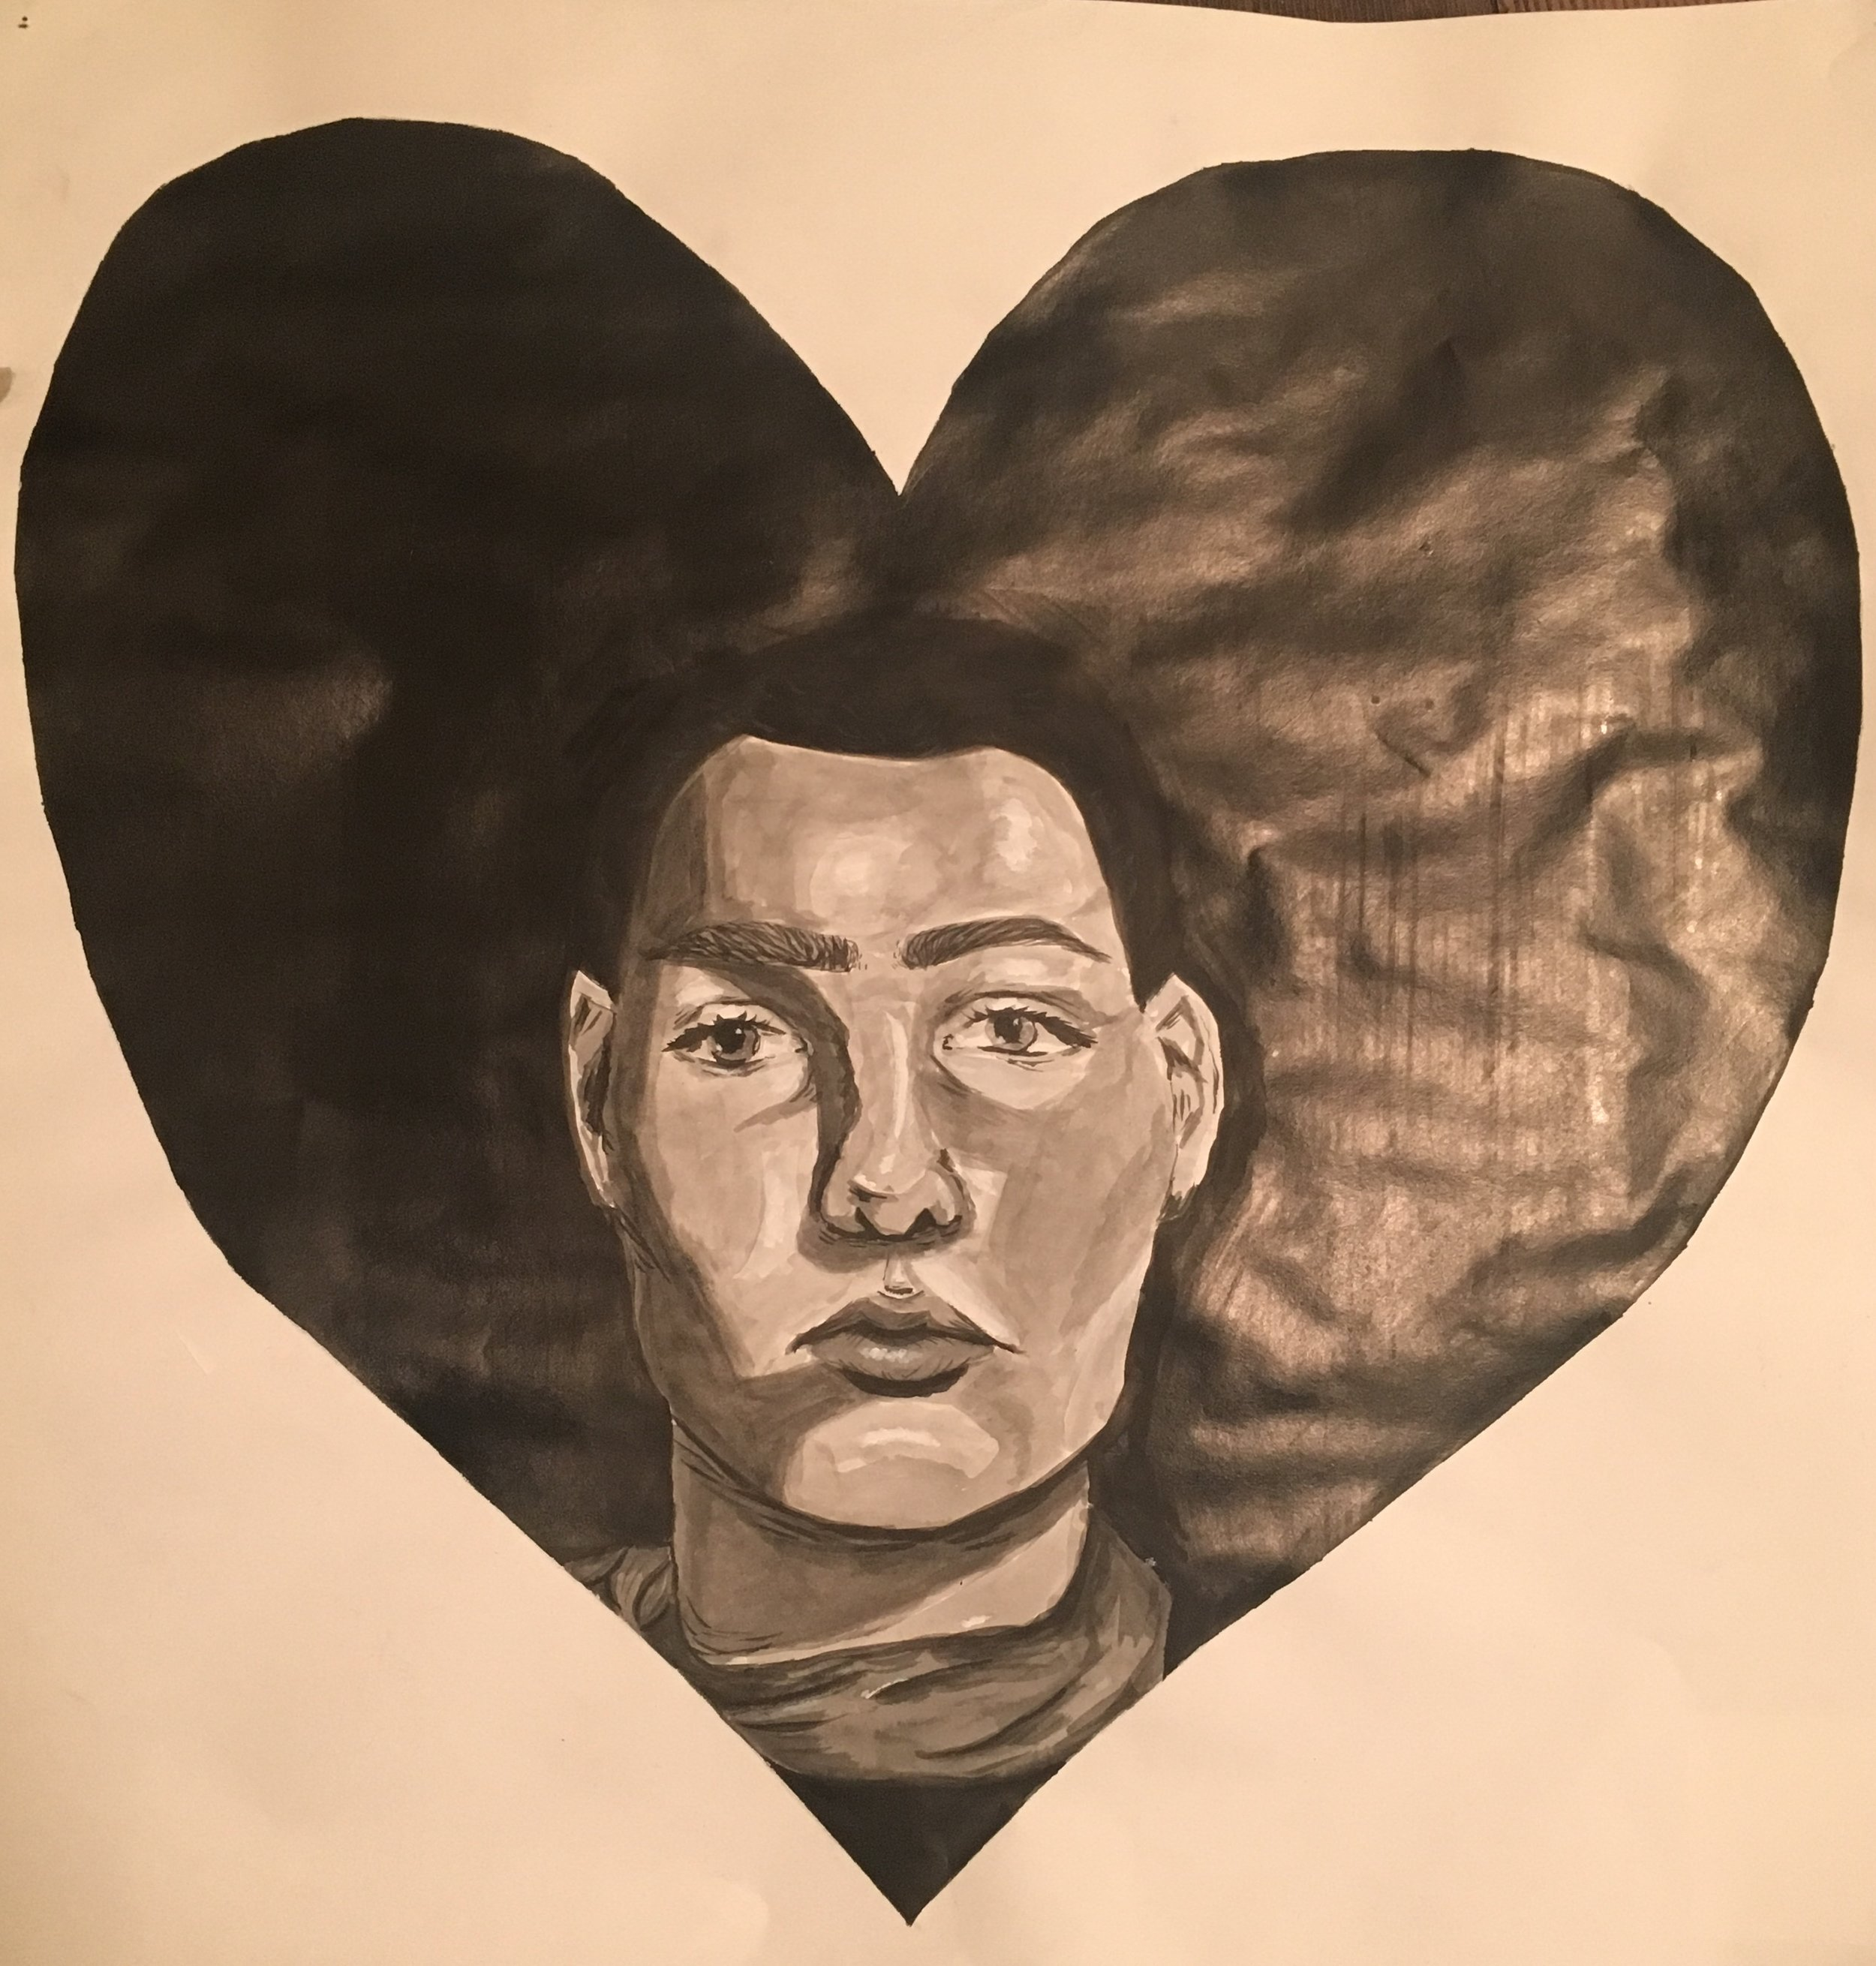 "Self (Portrait) Love , Arlo Van Liew - 12"" x 12"" - Sumi ink - $150 starting bid"